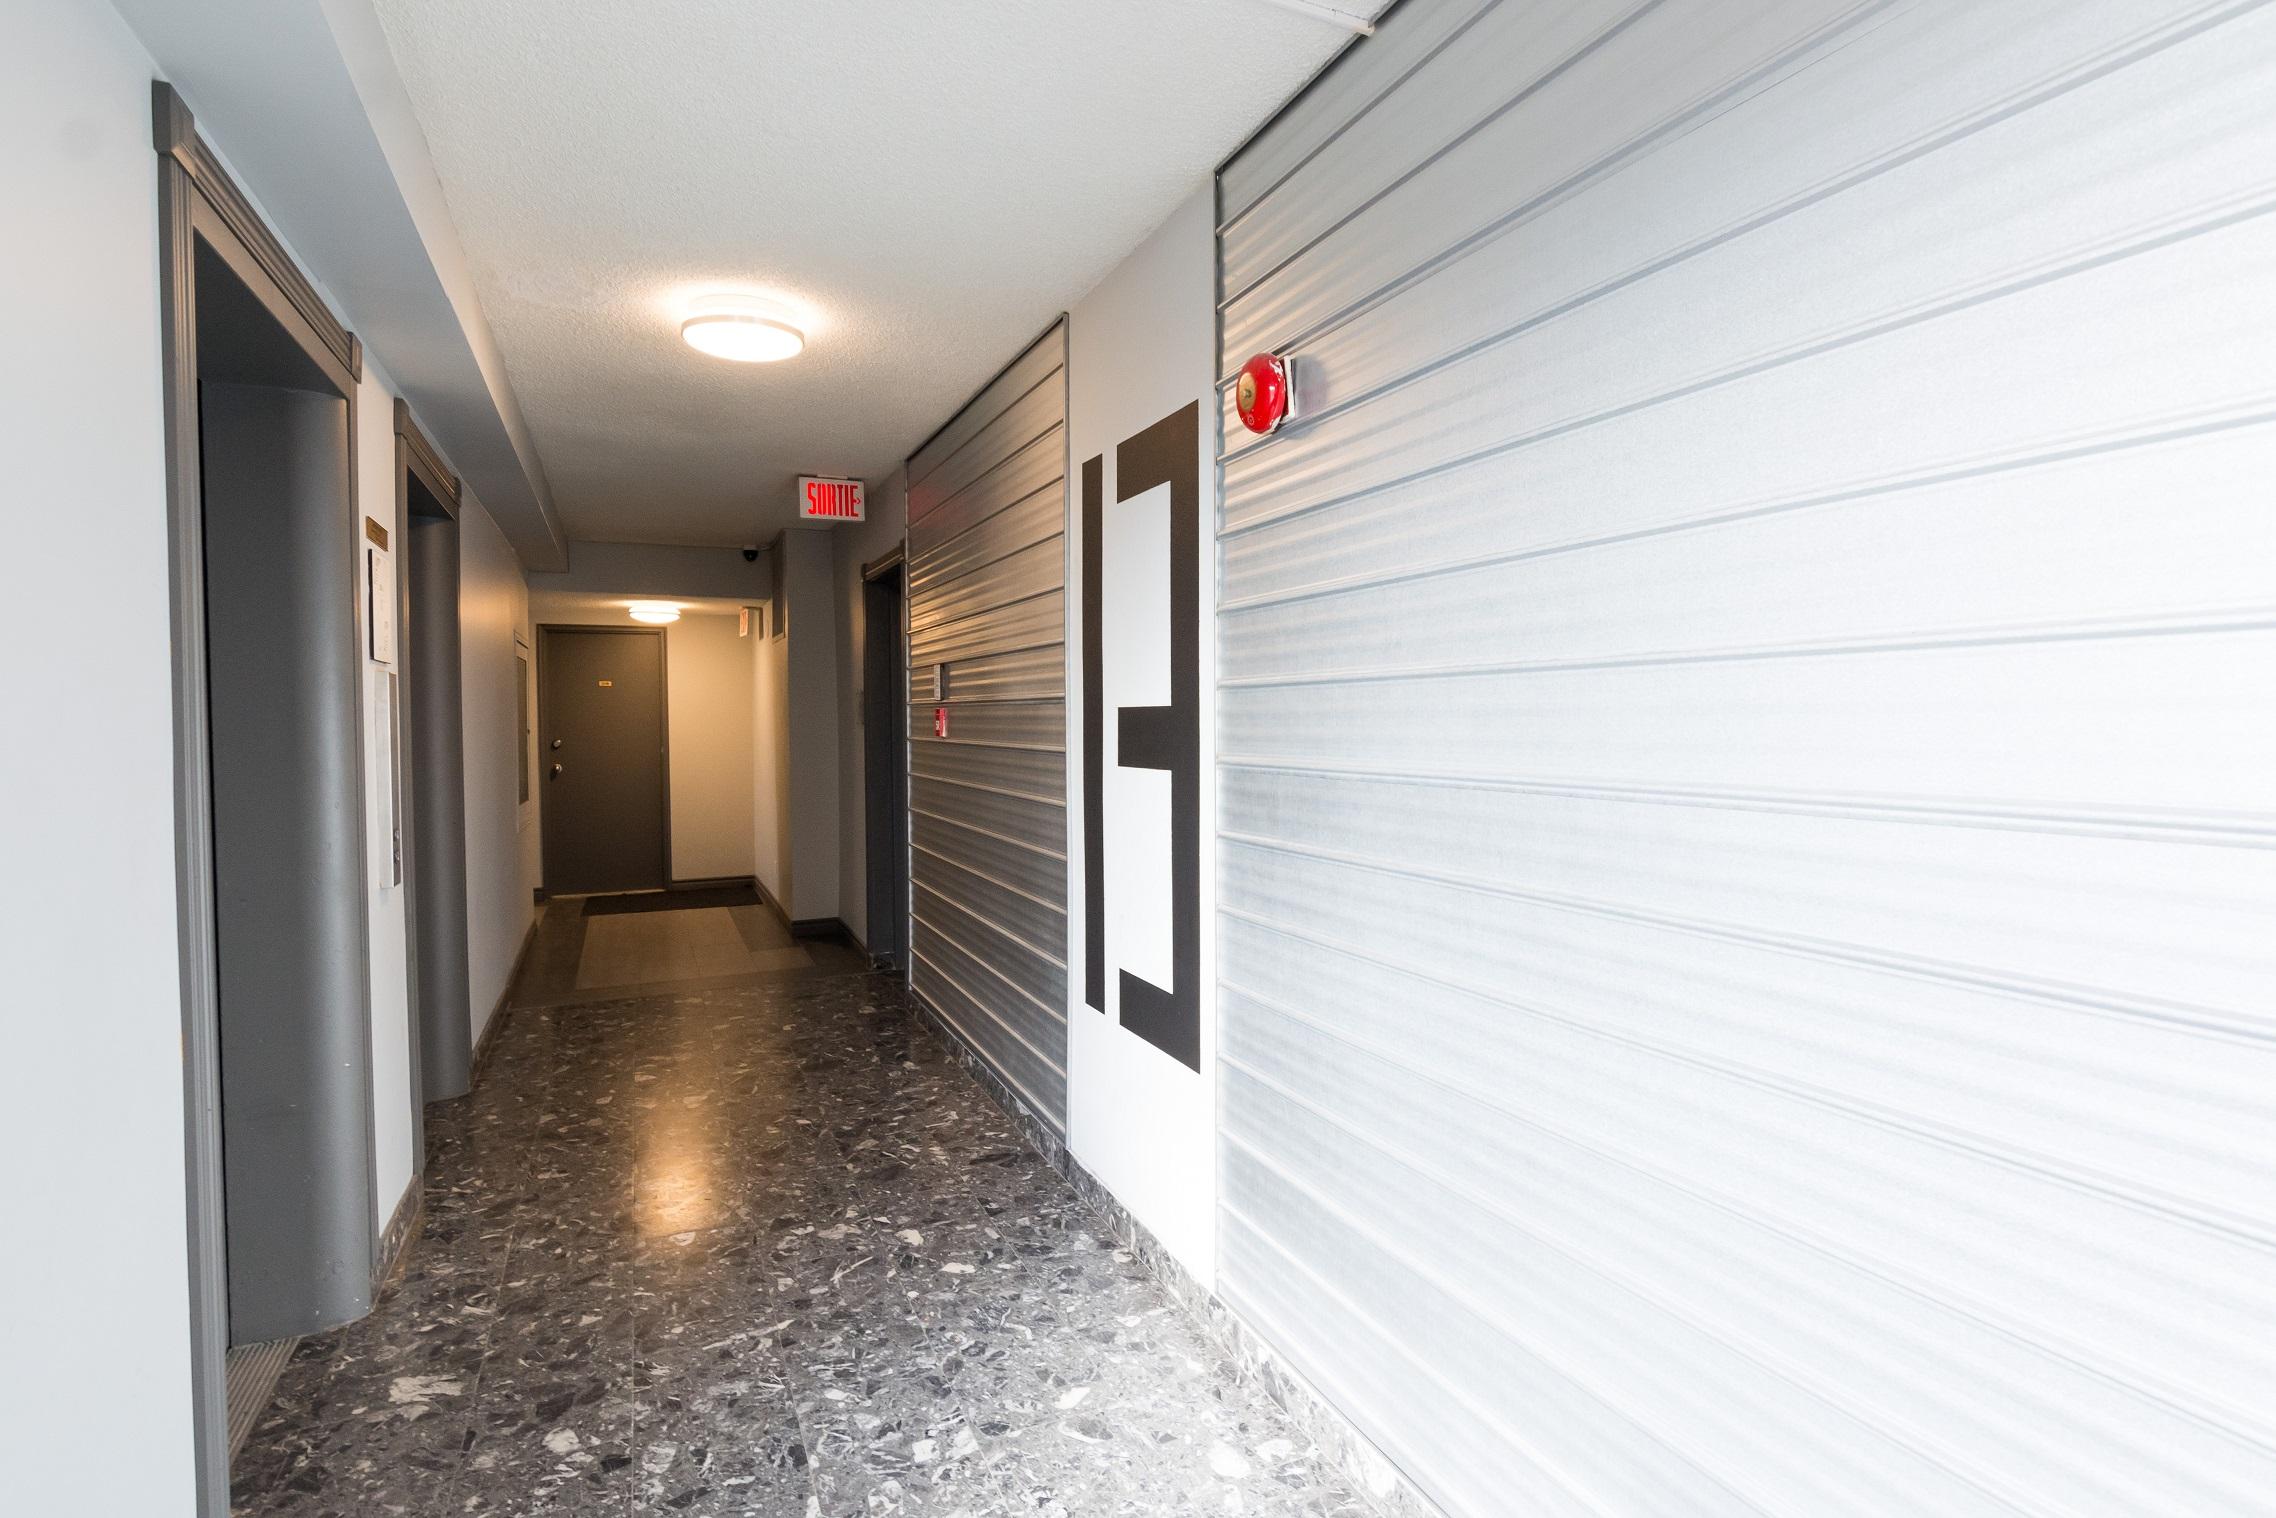 1 bedroom Apartments for rent in Notre-Dame-de-Grace at Tour Girouard - Photo 06 - RentQuebecApartments – L788